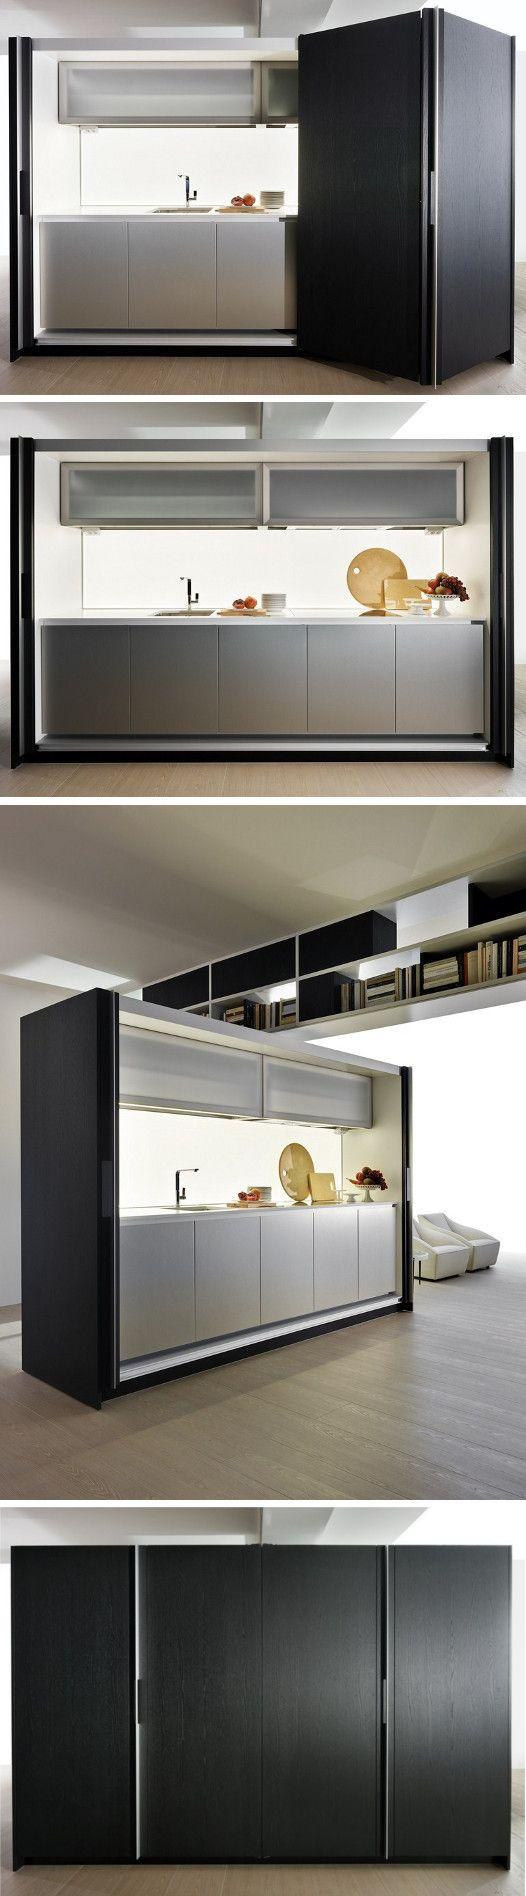 cuisine invisible cuisine. Black Bedroom Furniture Sets. Home Design Ideas